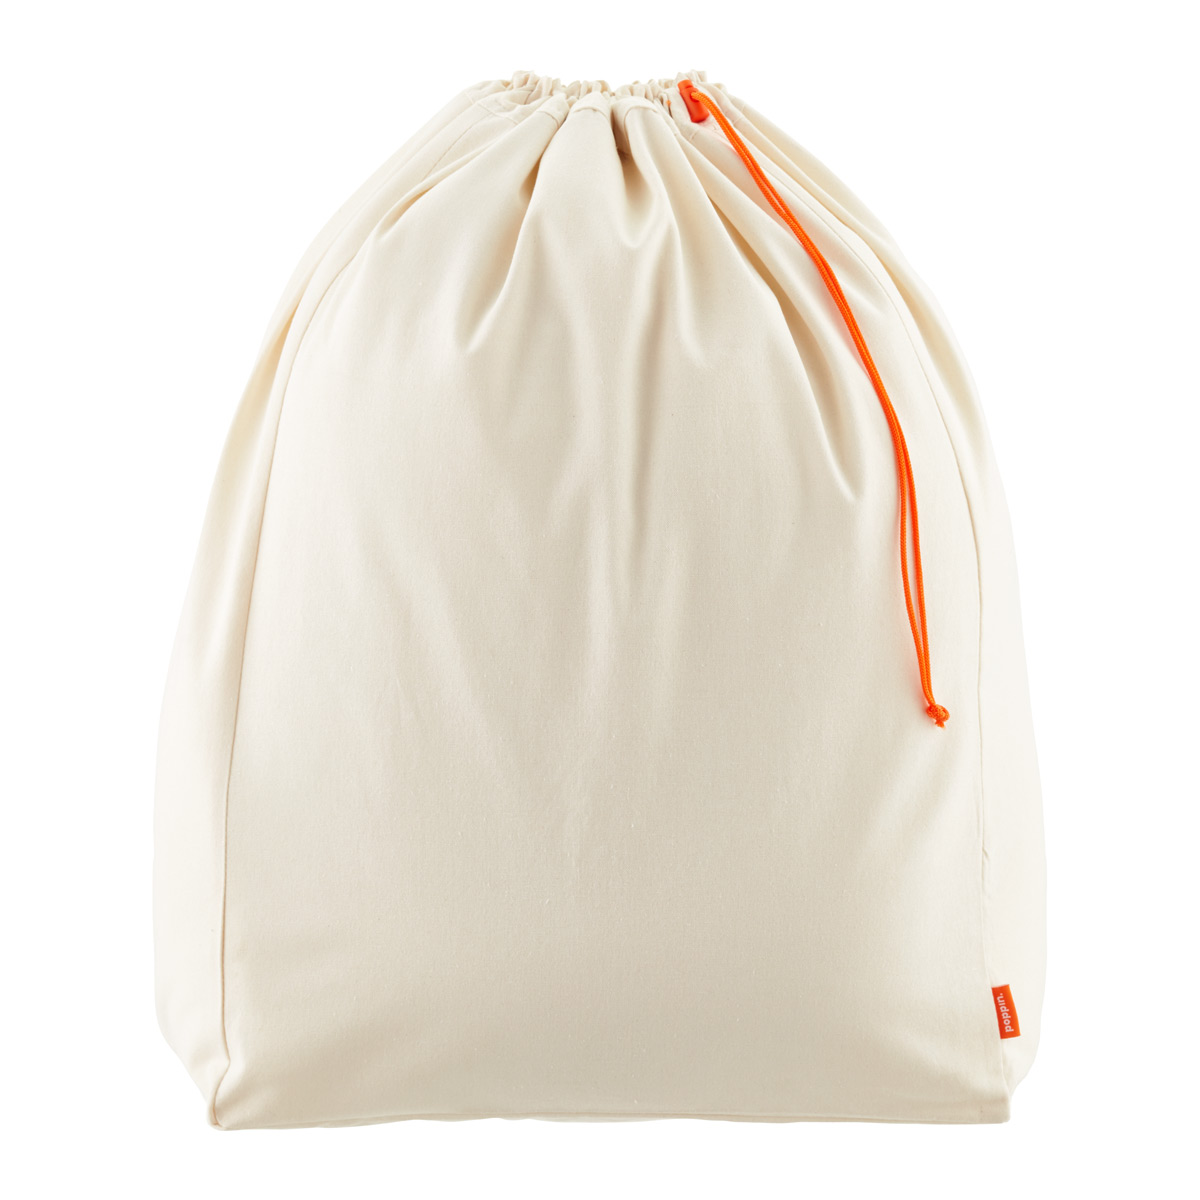 Replacement Laundry Hamper Bag